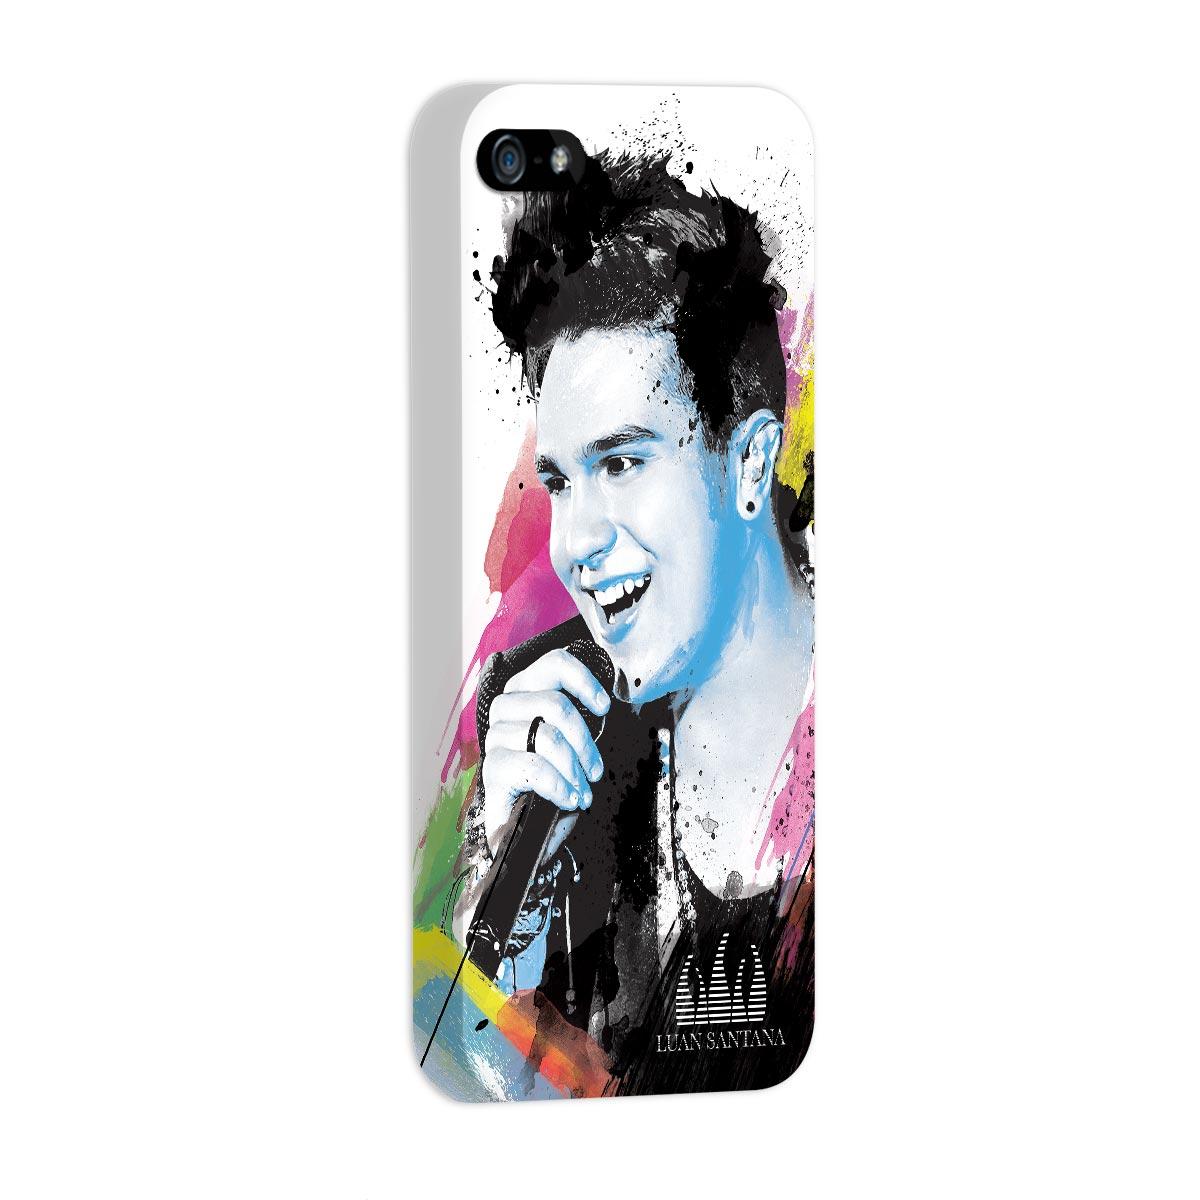 Capa de iPhone 5/5S Luan Santana Foto Colors